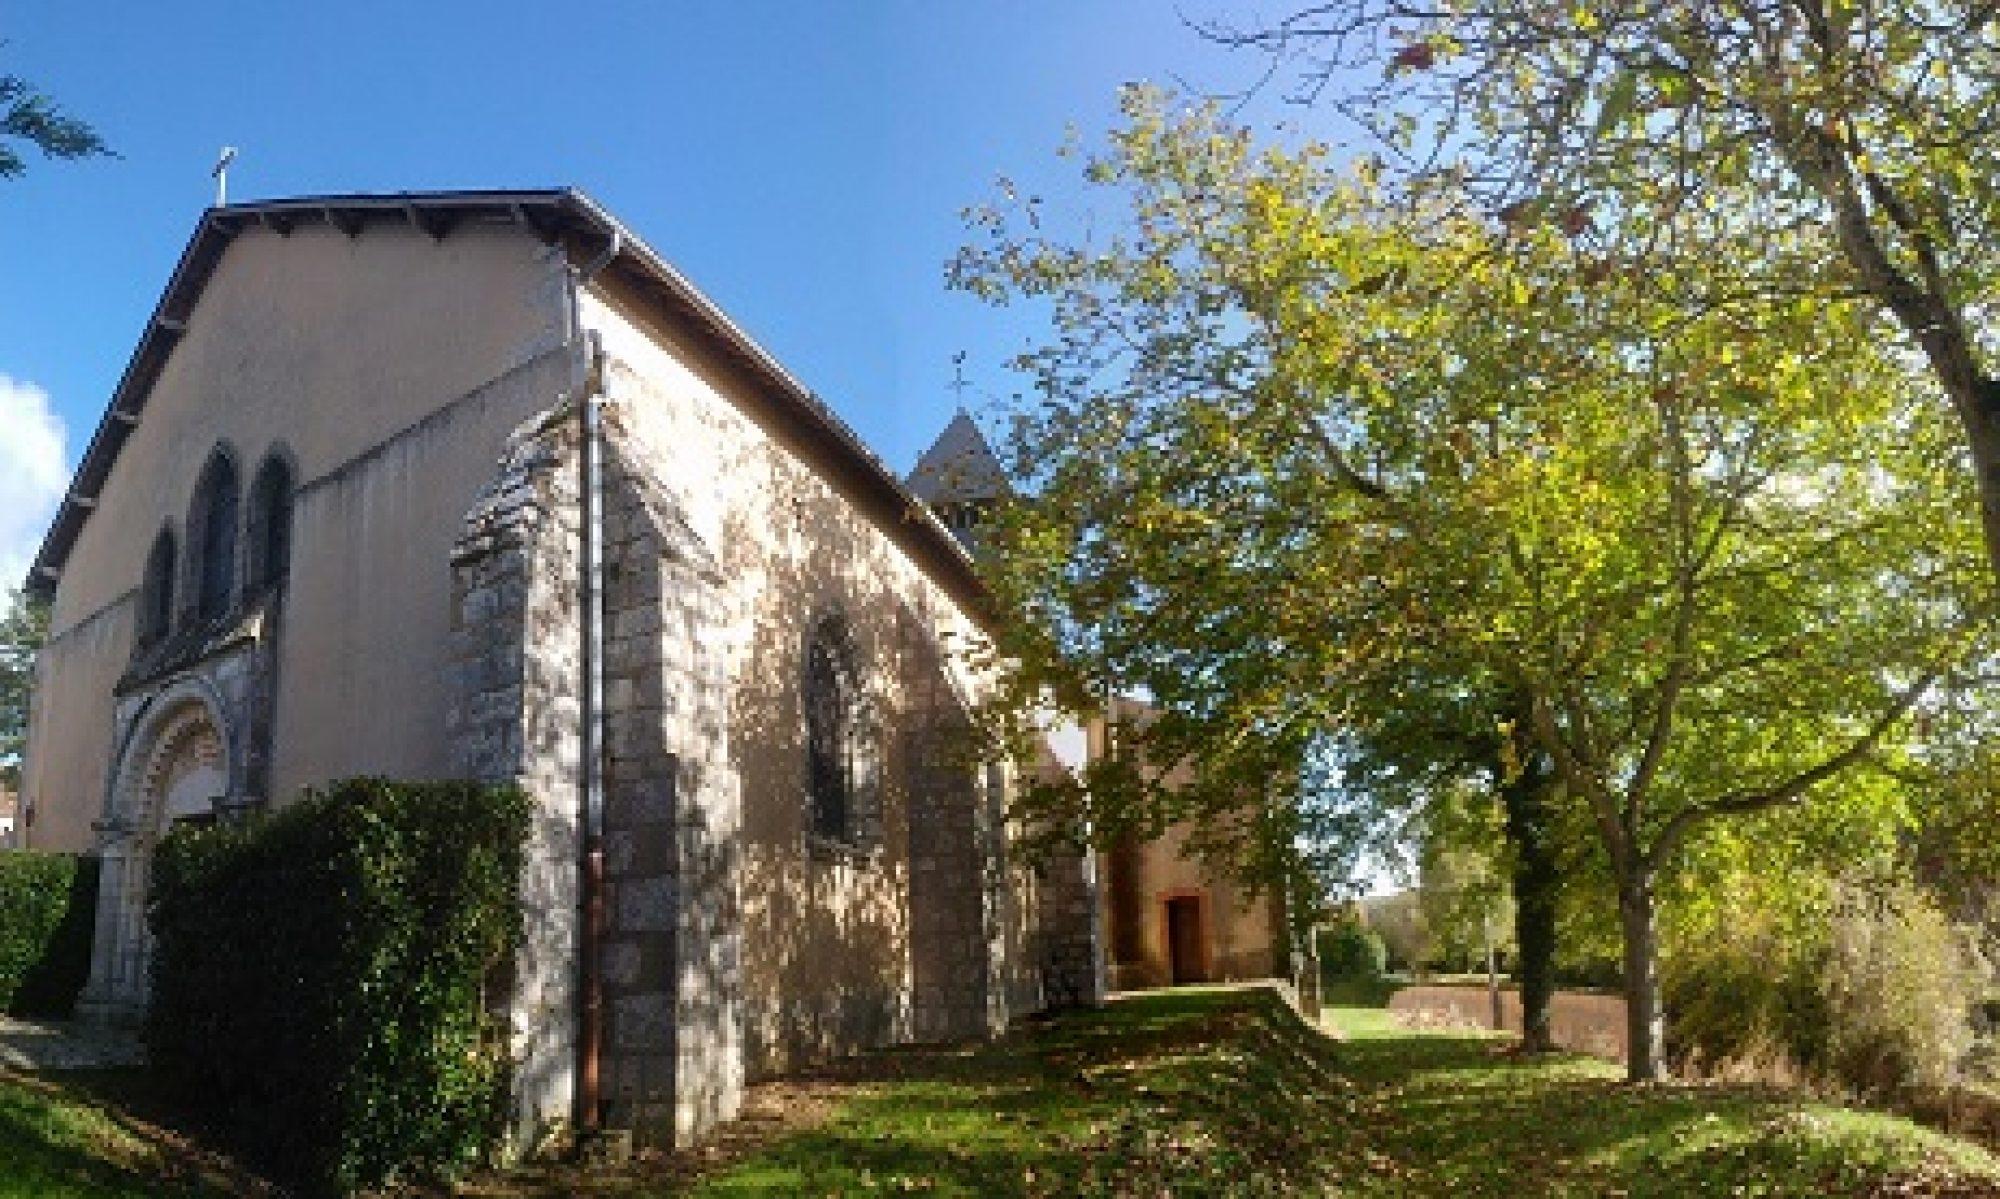 Saint-Maurice-sur-Aveyron Loiret